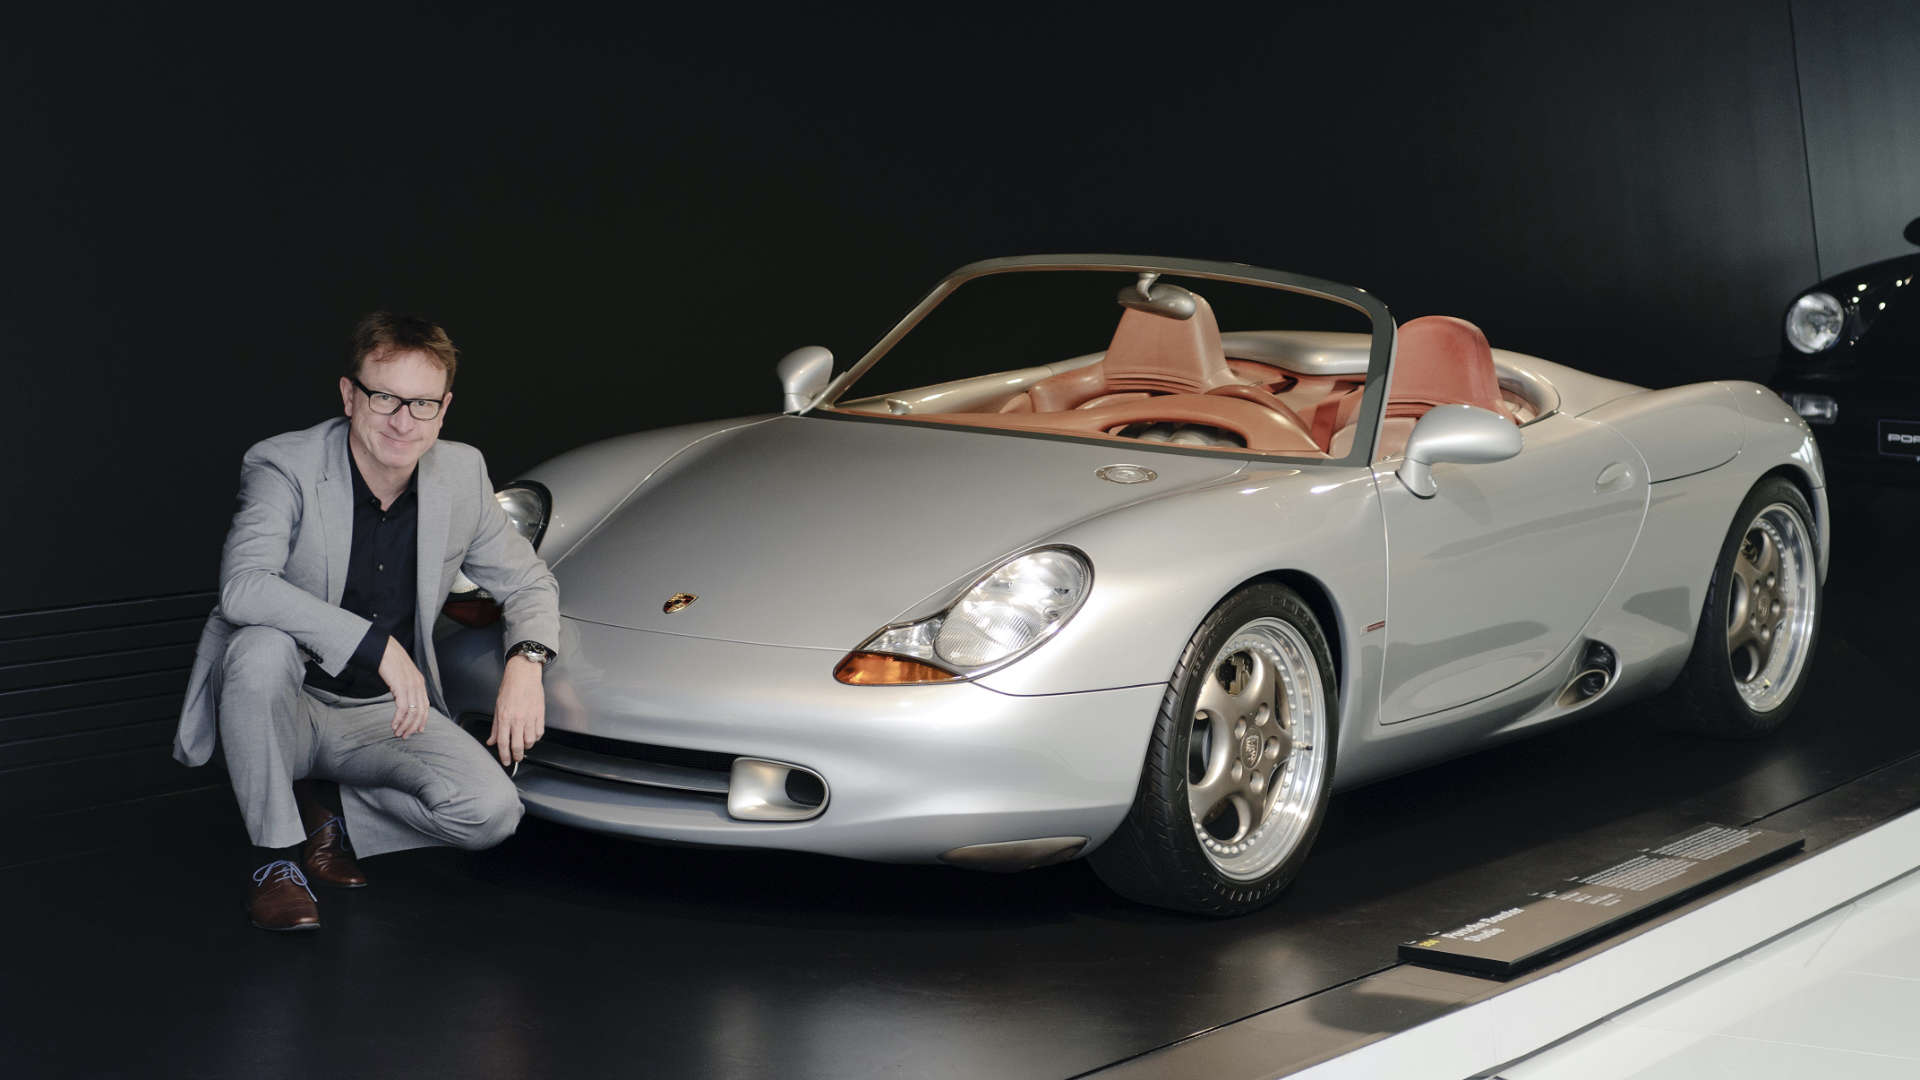 Grant Larson Konzeptstudie Porsche Boxster